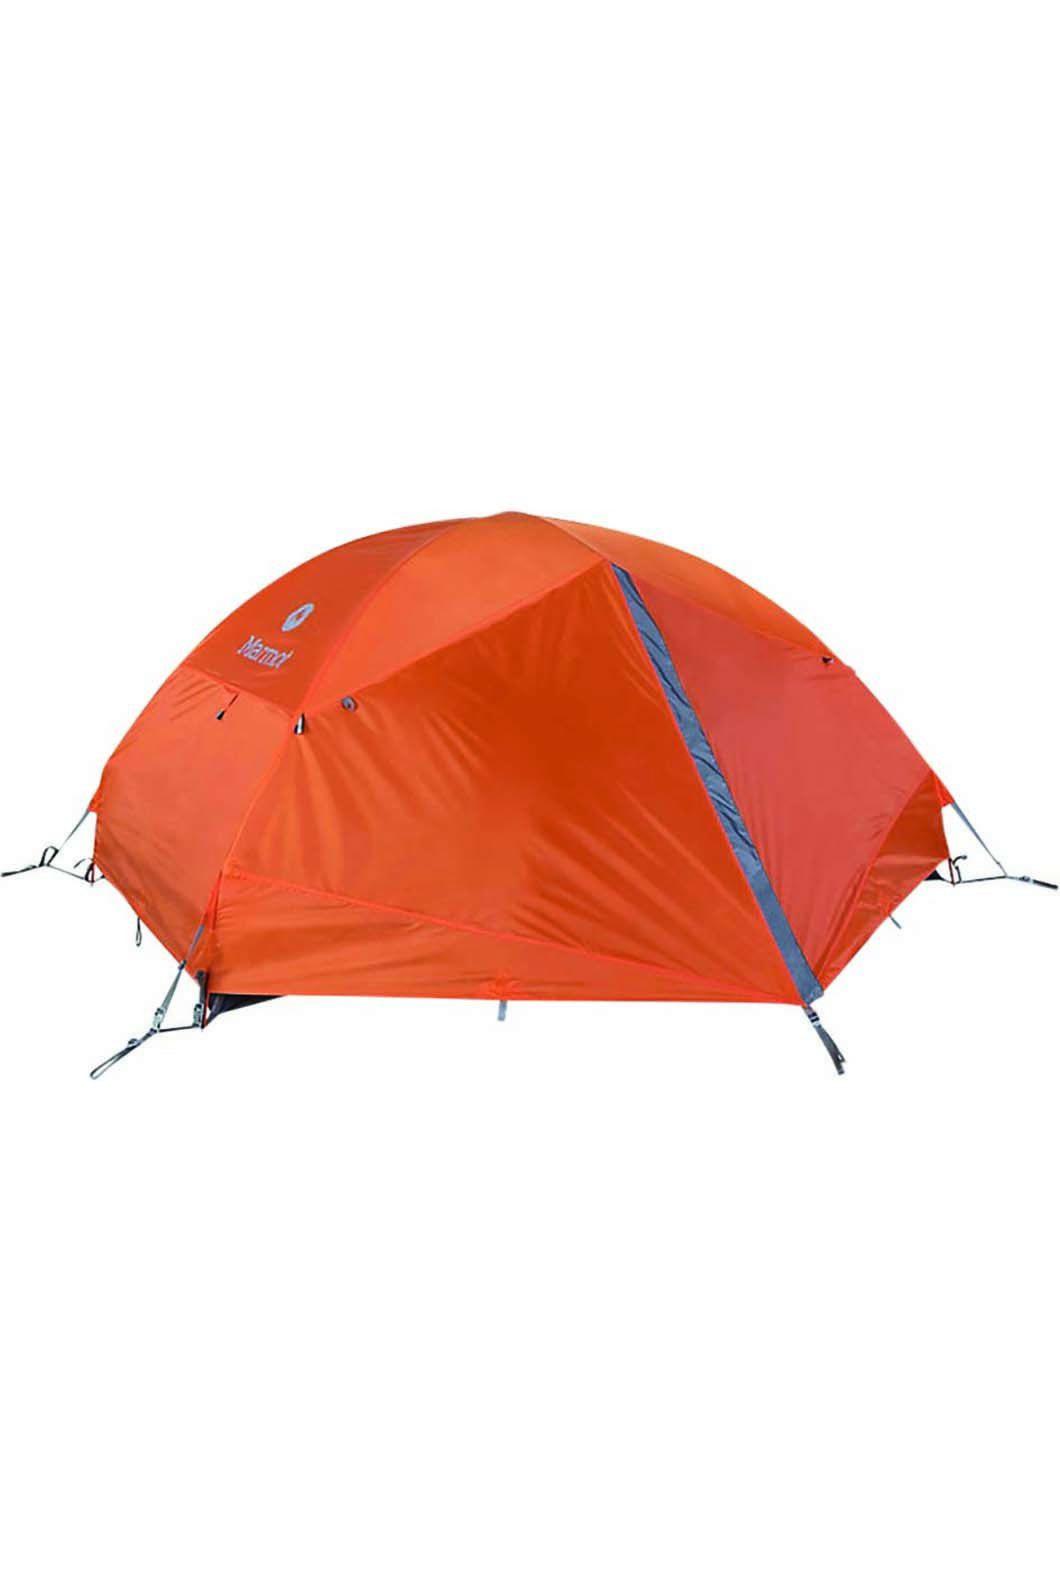 Marmot Fortress Hiking Tent 2 Person 2 Person, None, hi-res